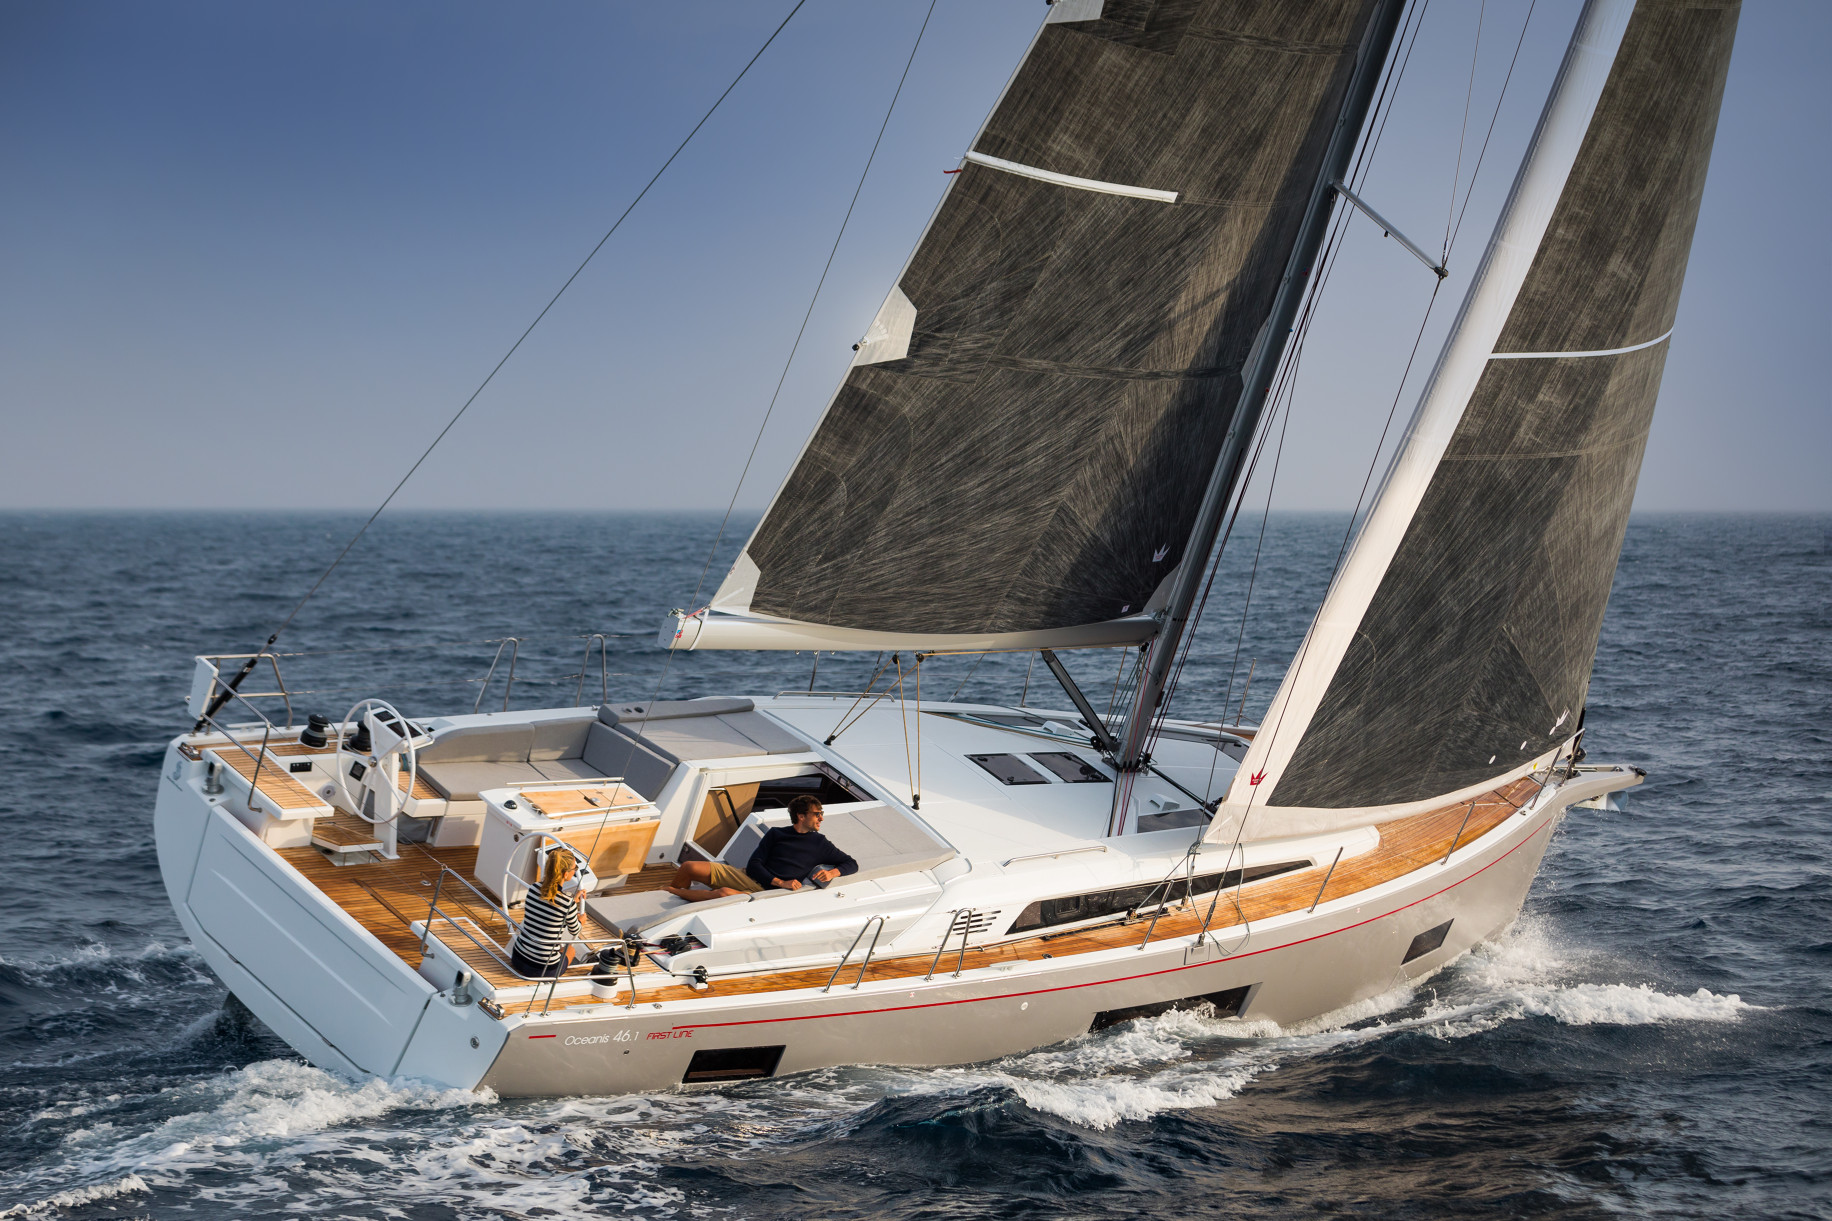 Beneteau Oceanis 46 — Distinguished Performance